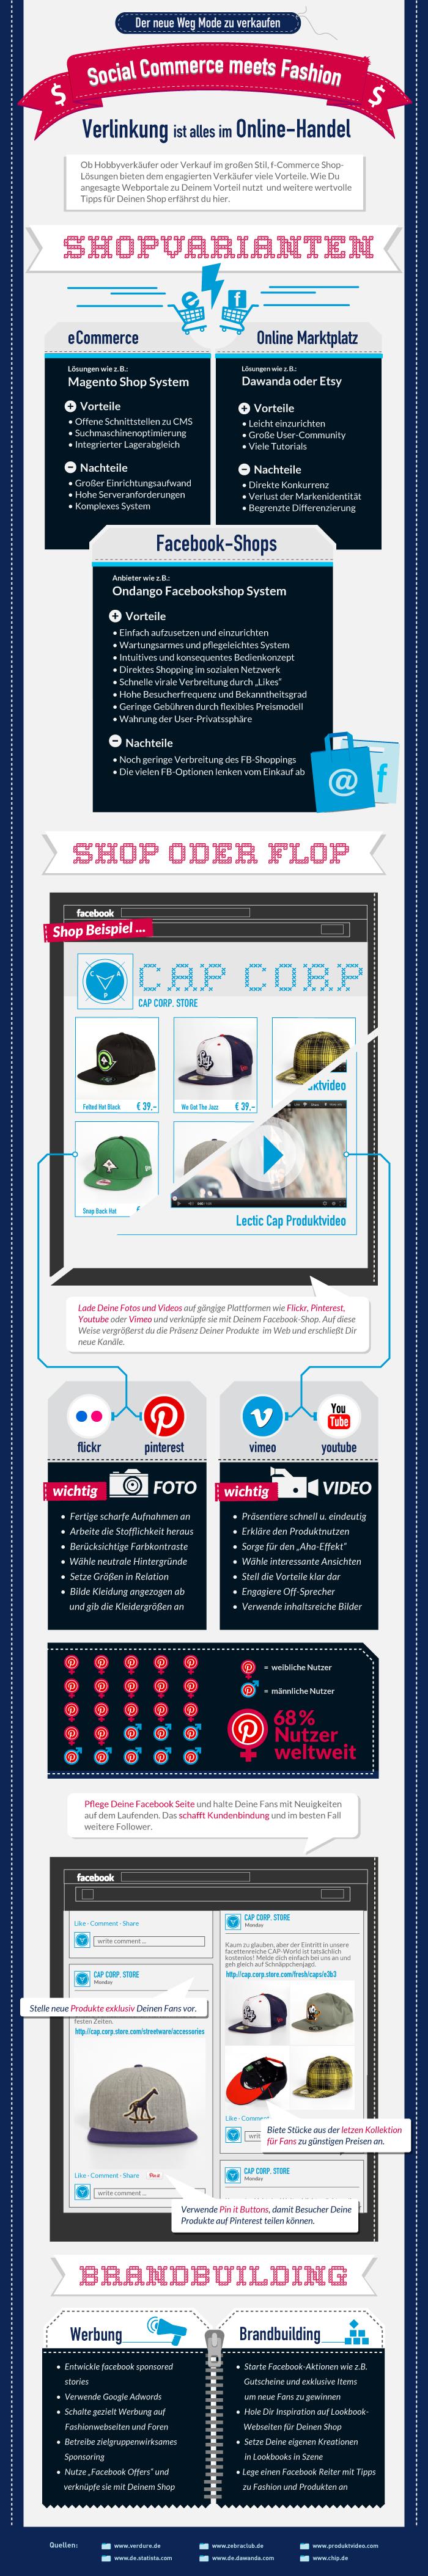 Infografik: Social Commerce am Beispiel Mode